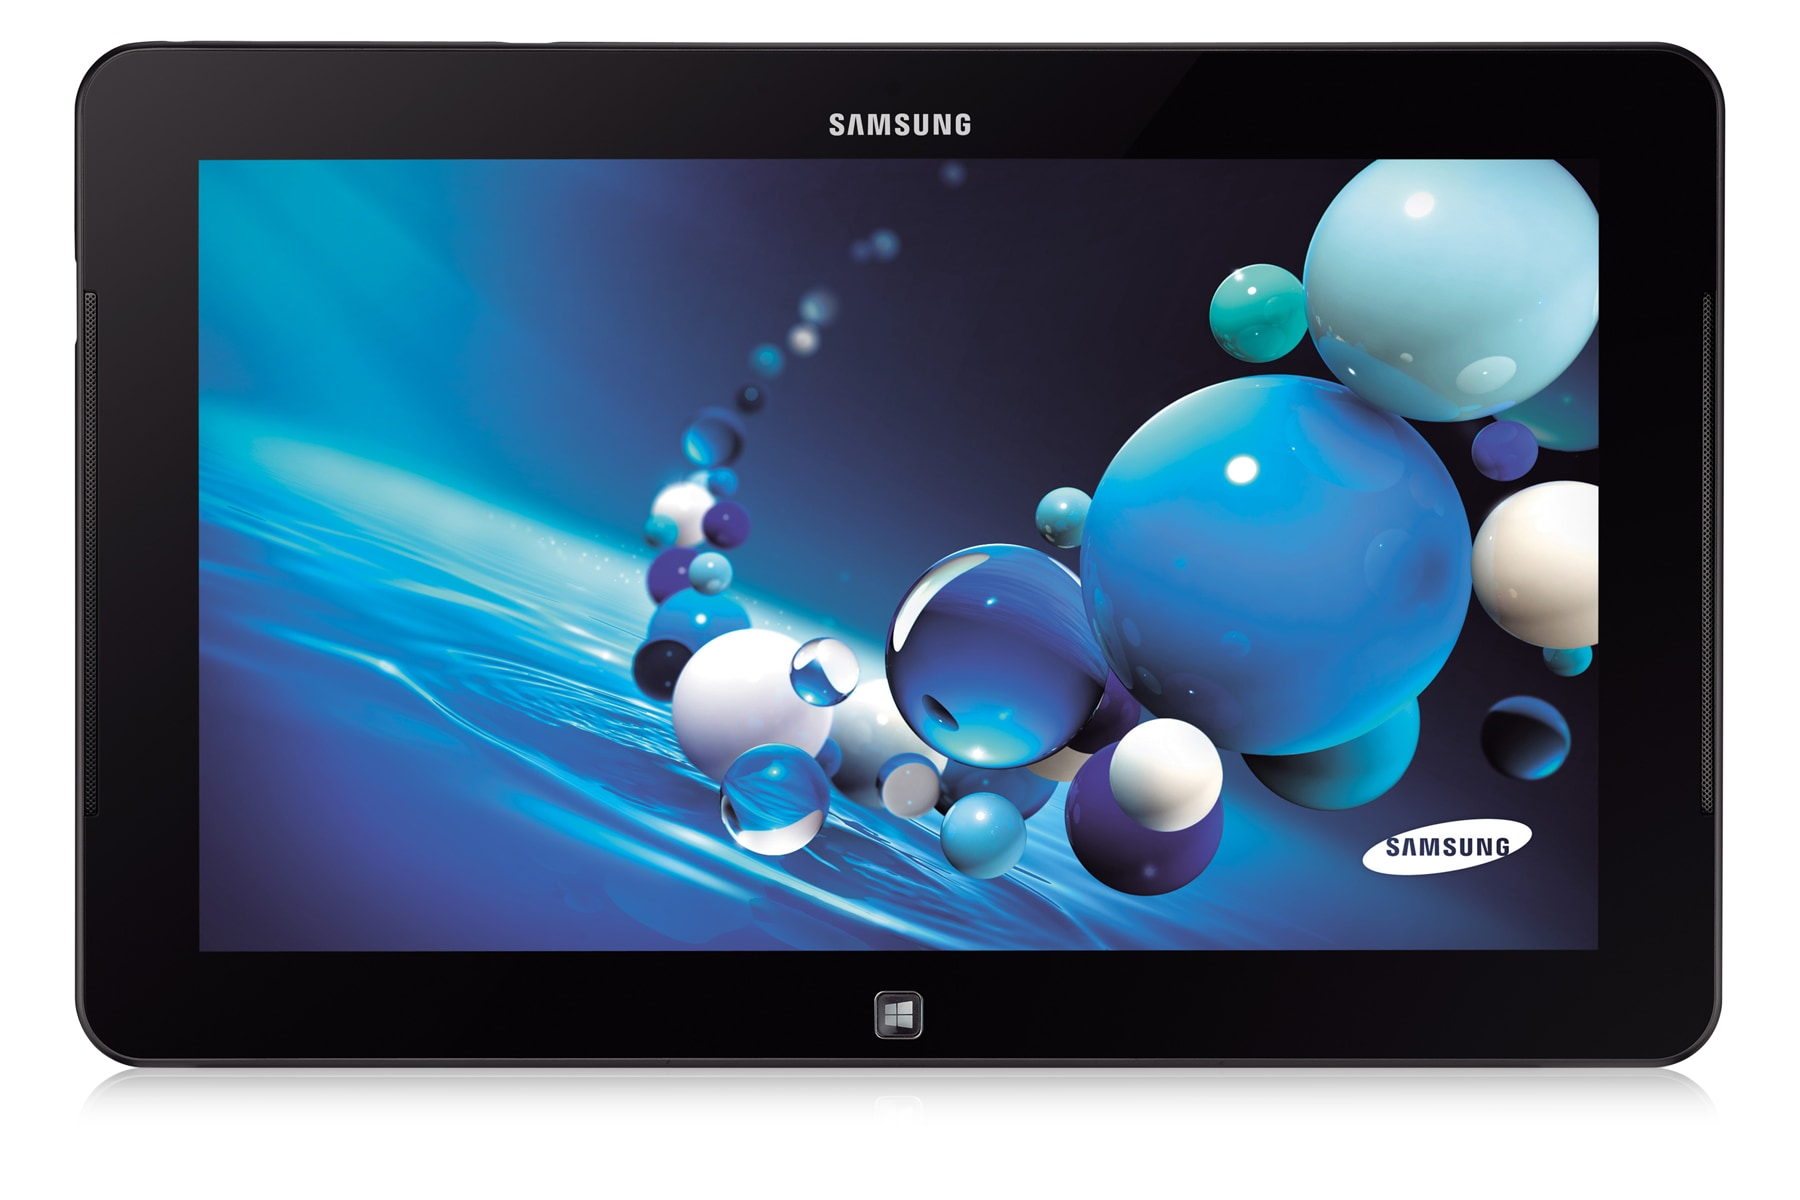 ATIV Smart PC Pro XE700T1C-A01CL